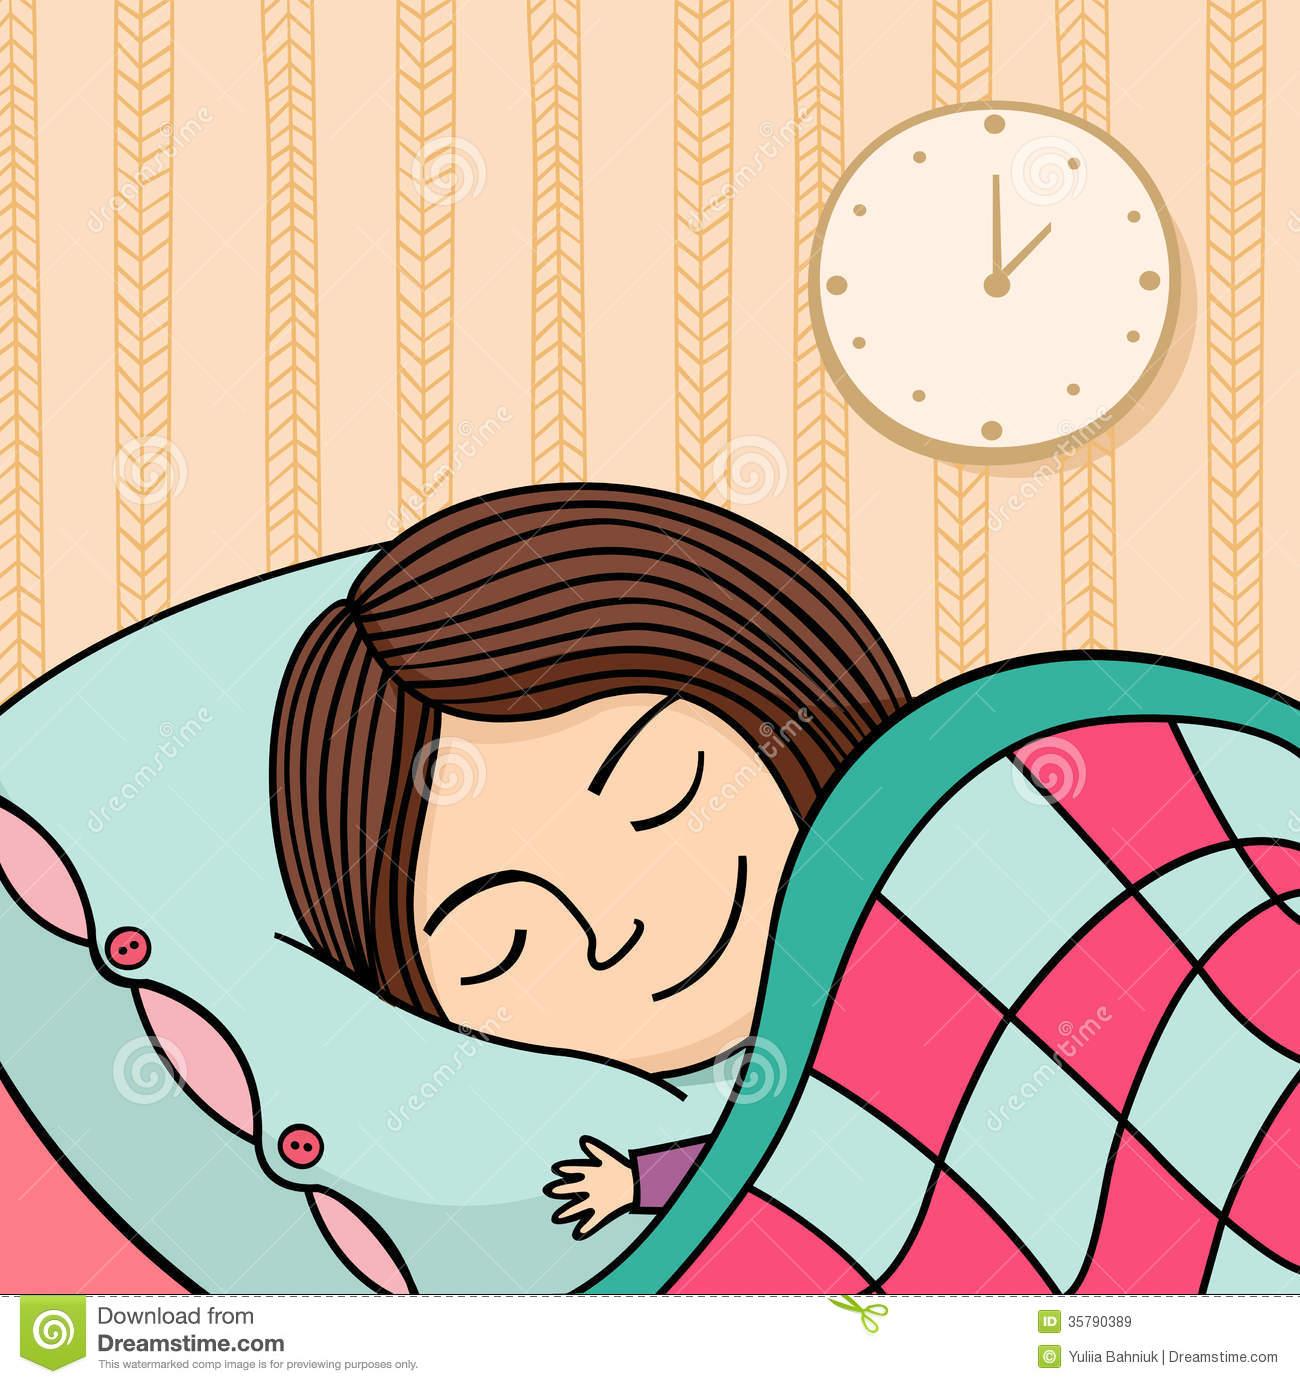 Woman sleepy pencil and. Clipart sleeping rest sleep